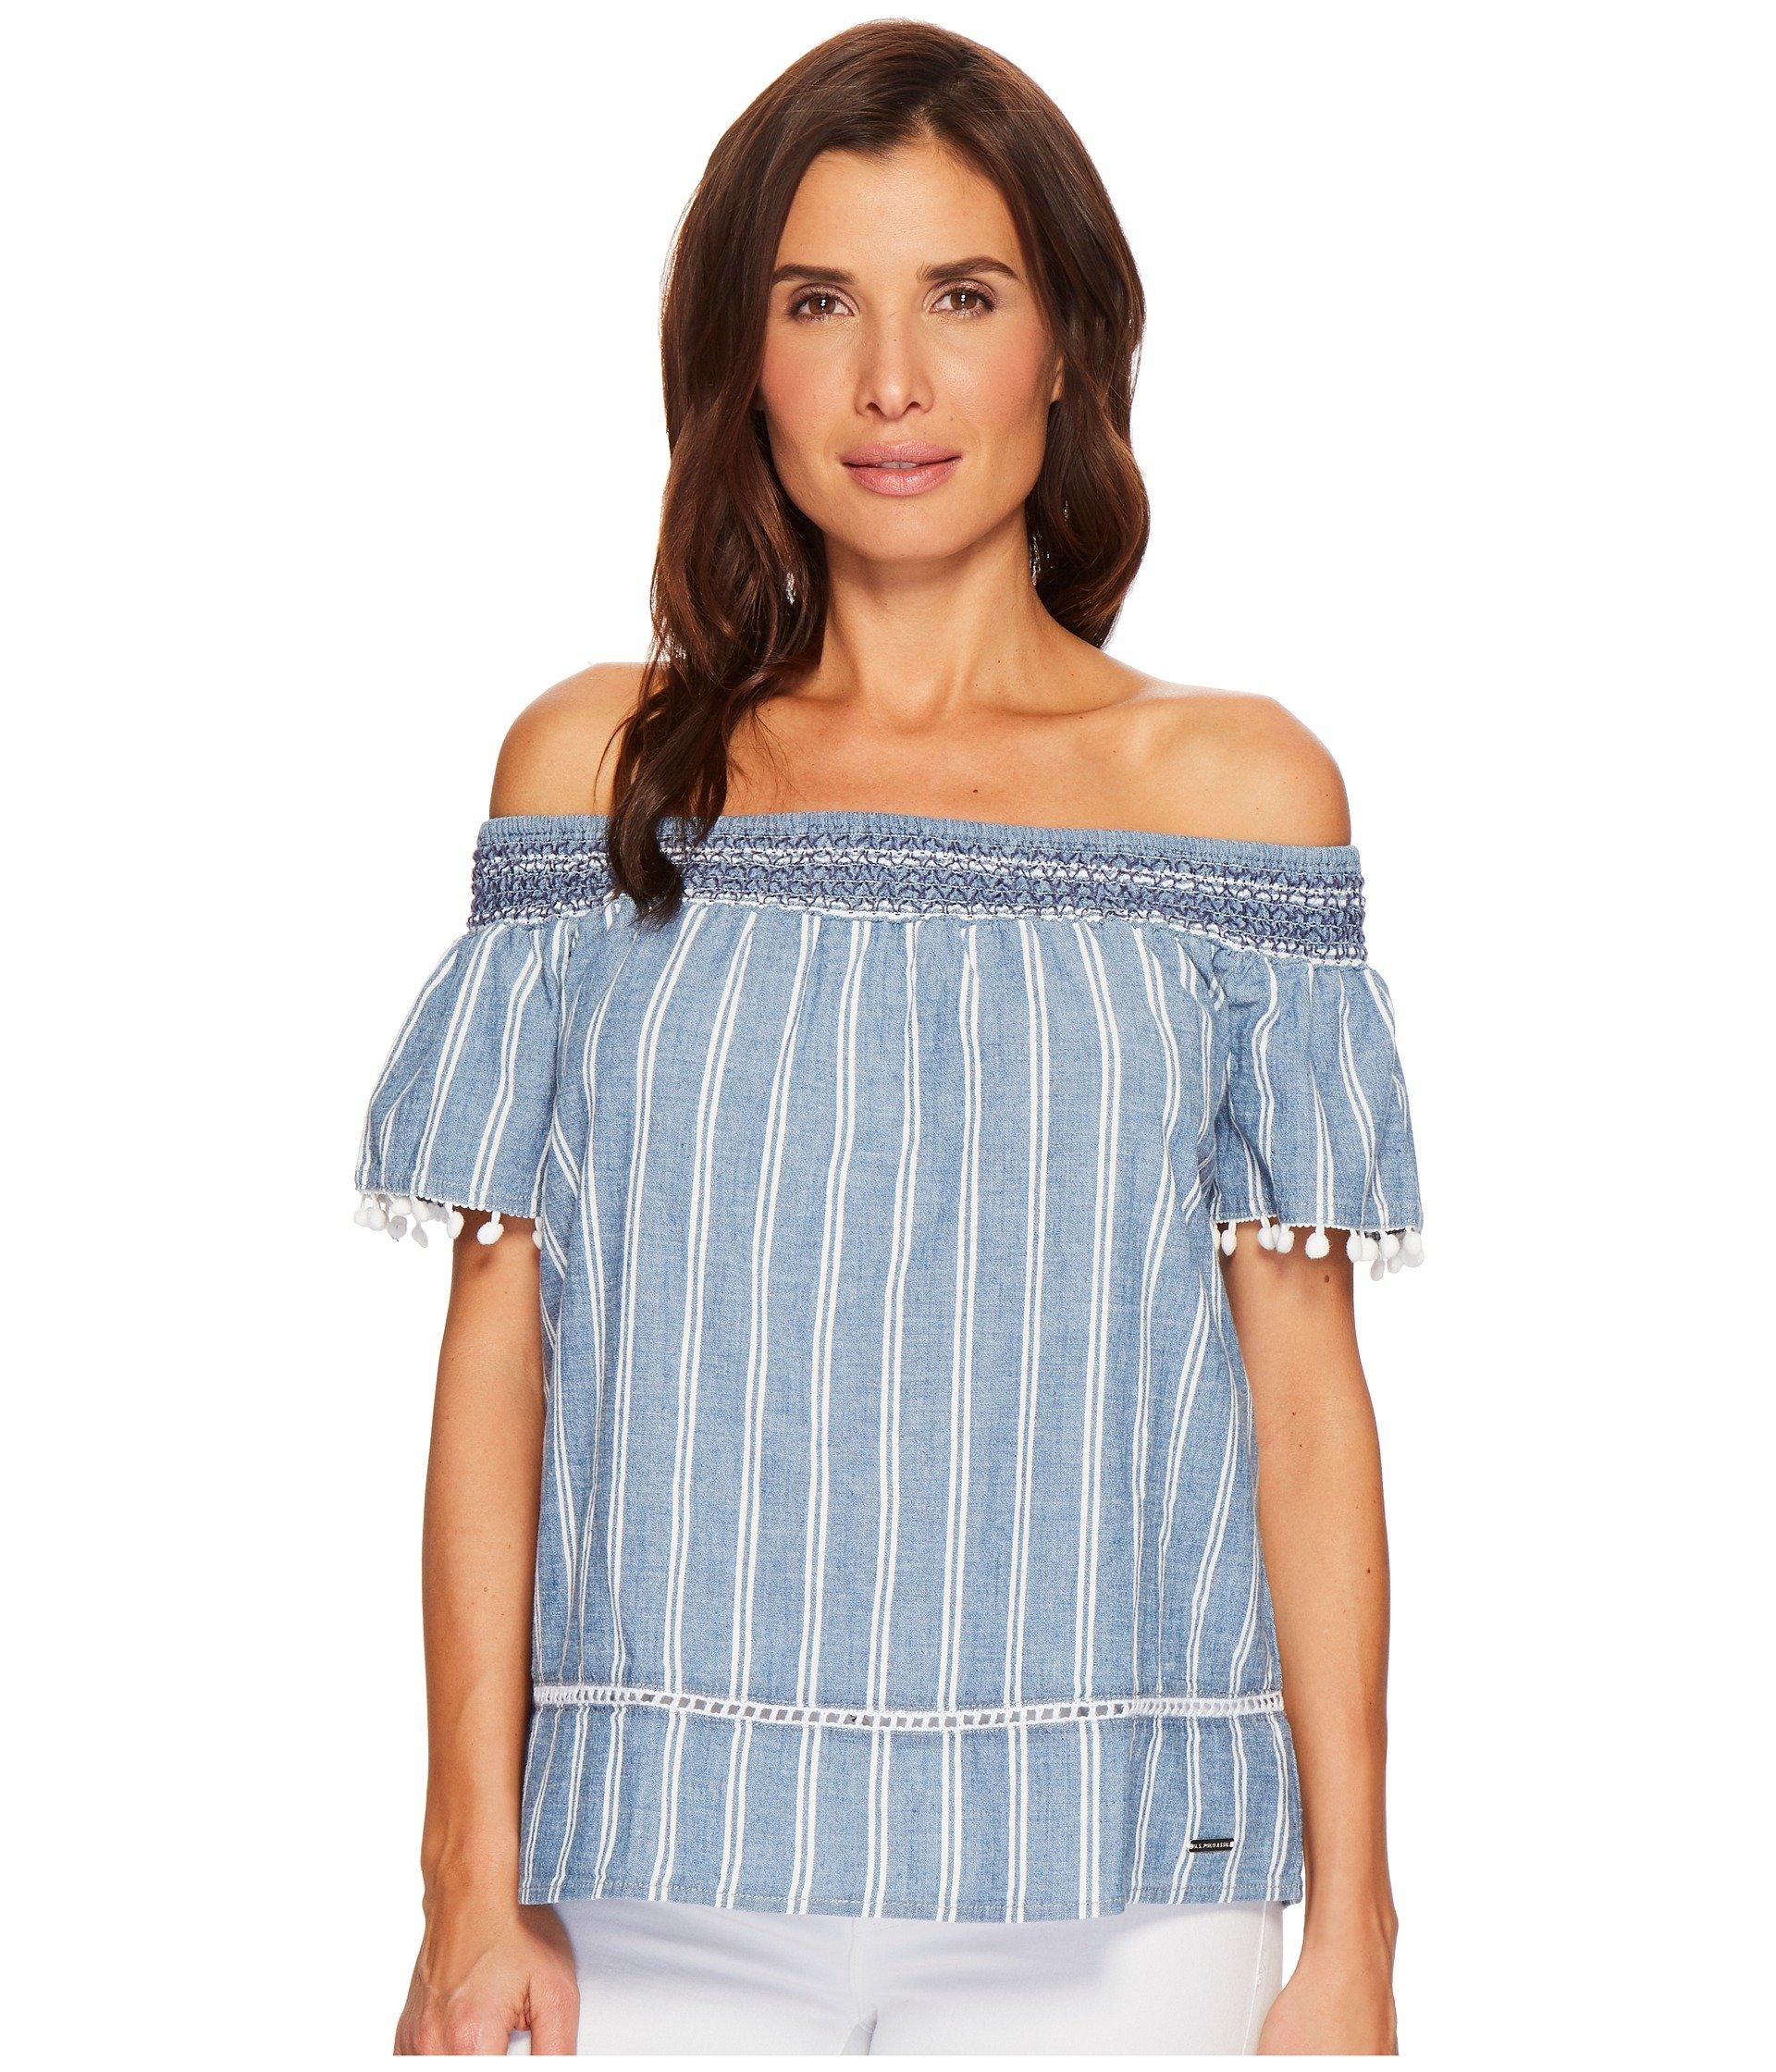 Blusa para Mujer U.S. POLO ASSN. Denim Off Shoulder Shirt  + U.S. POLO ASSN. en VeoyCompro.net